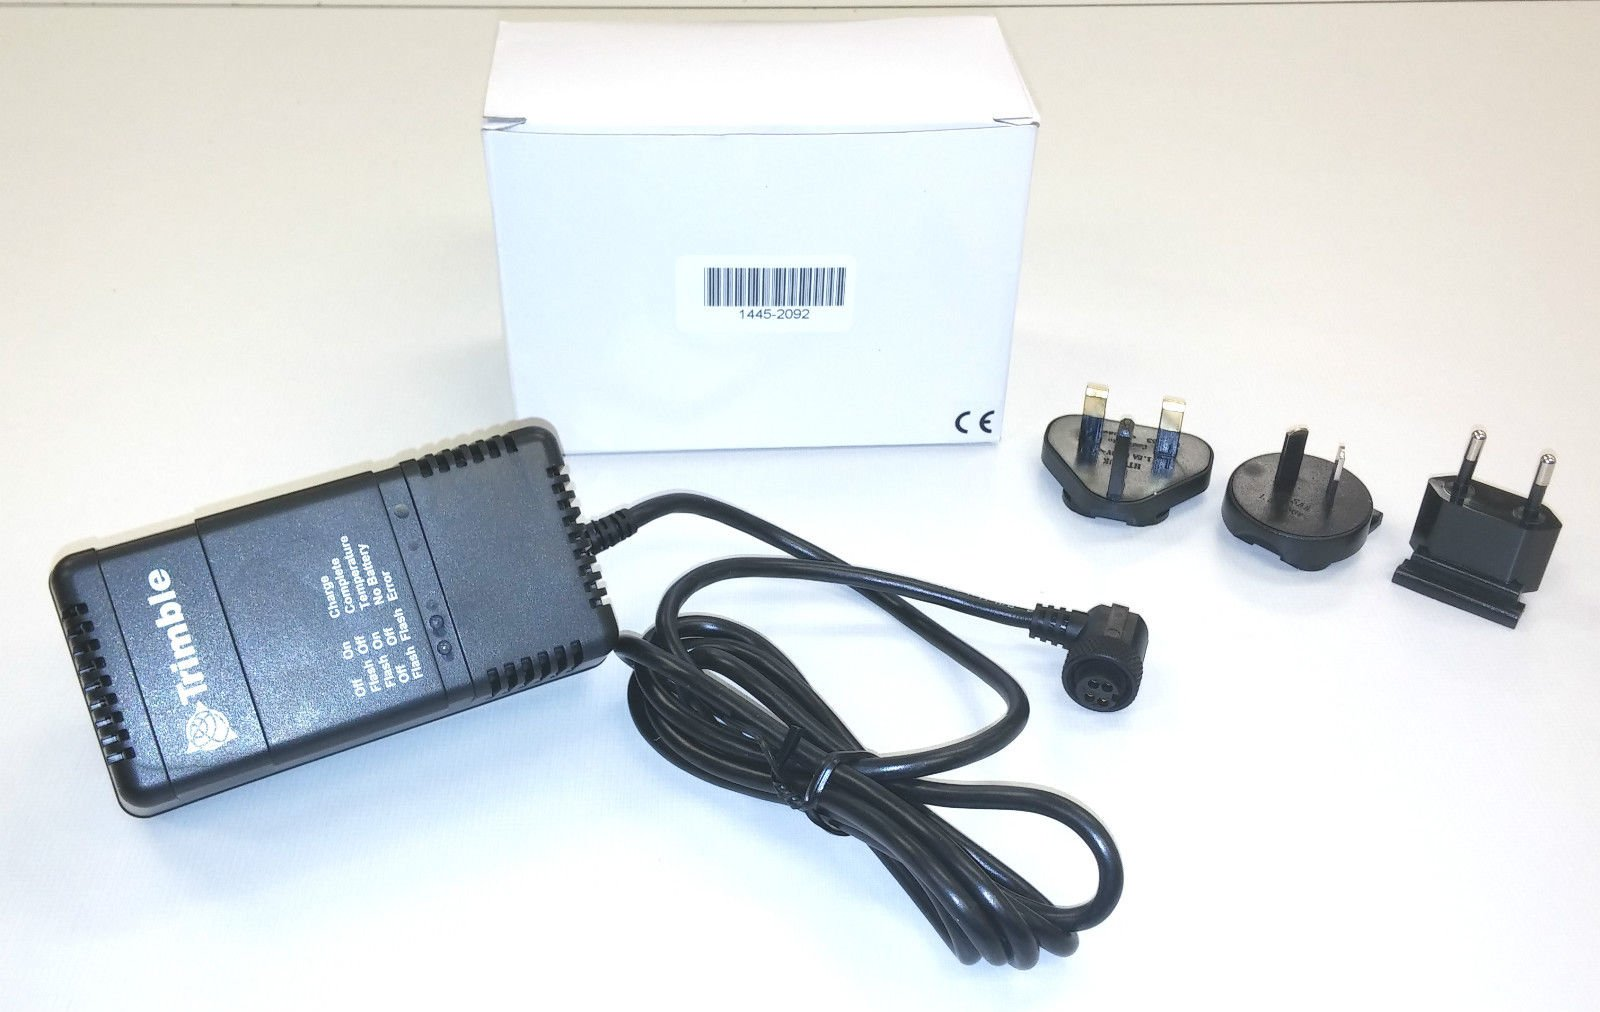 Spectra Precision Grade Slope Laser Charger GL710 GL720 GL722 GL742 GL762 1445-2092 Trimble Machine Control